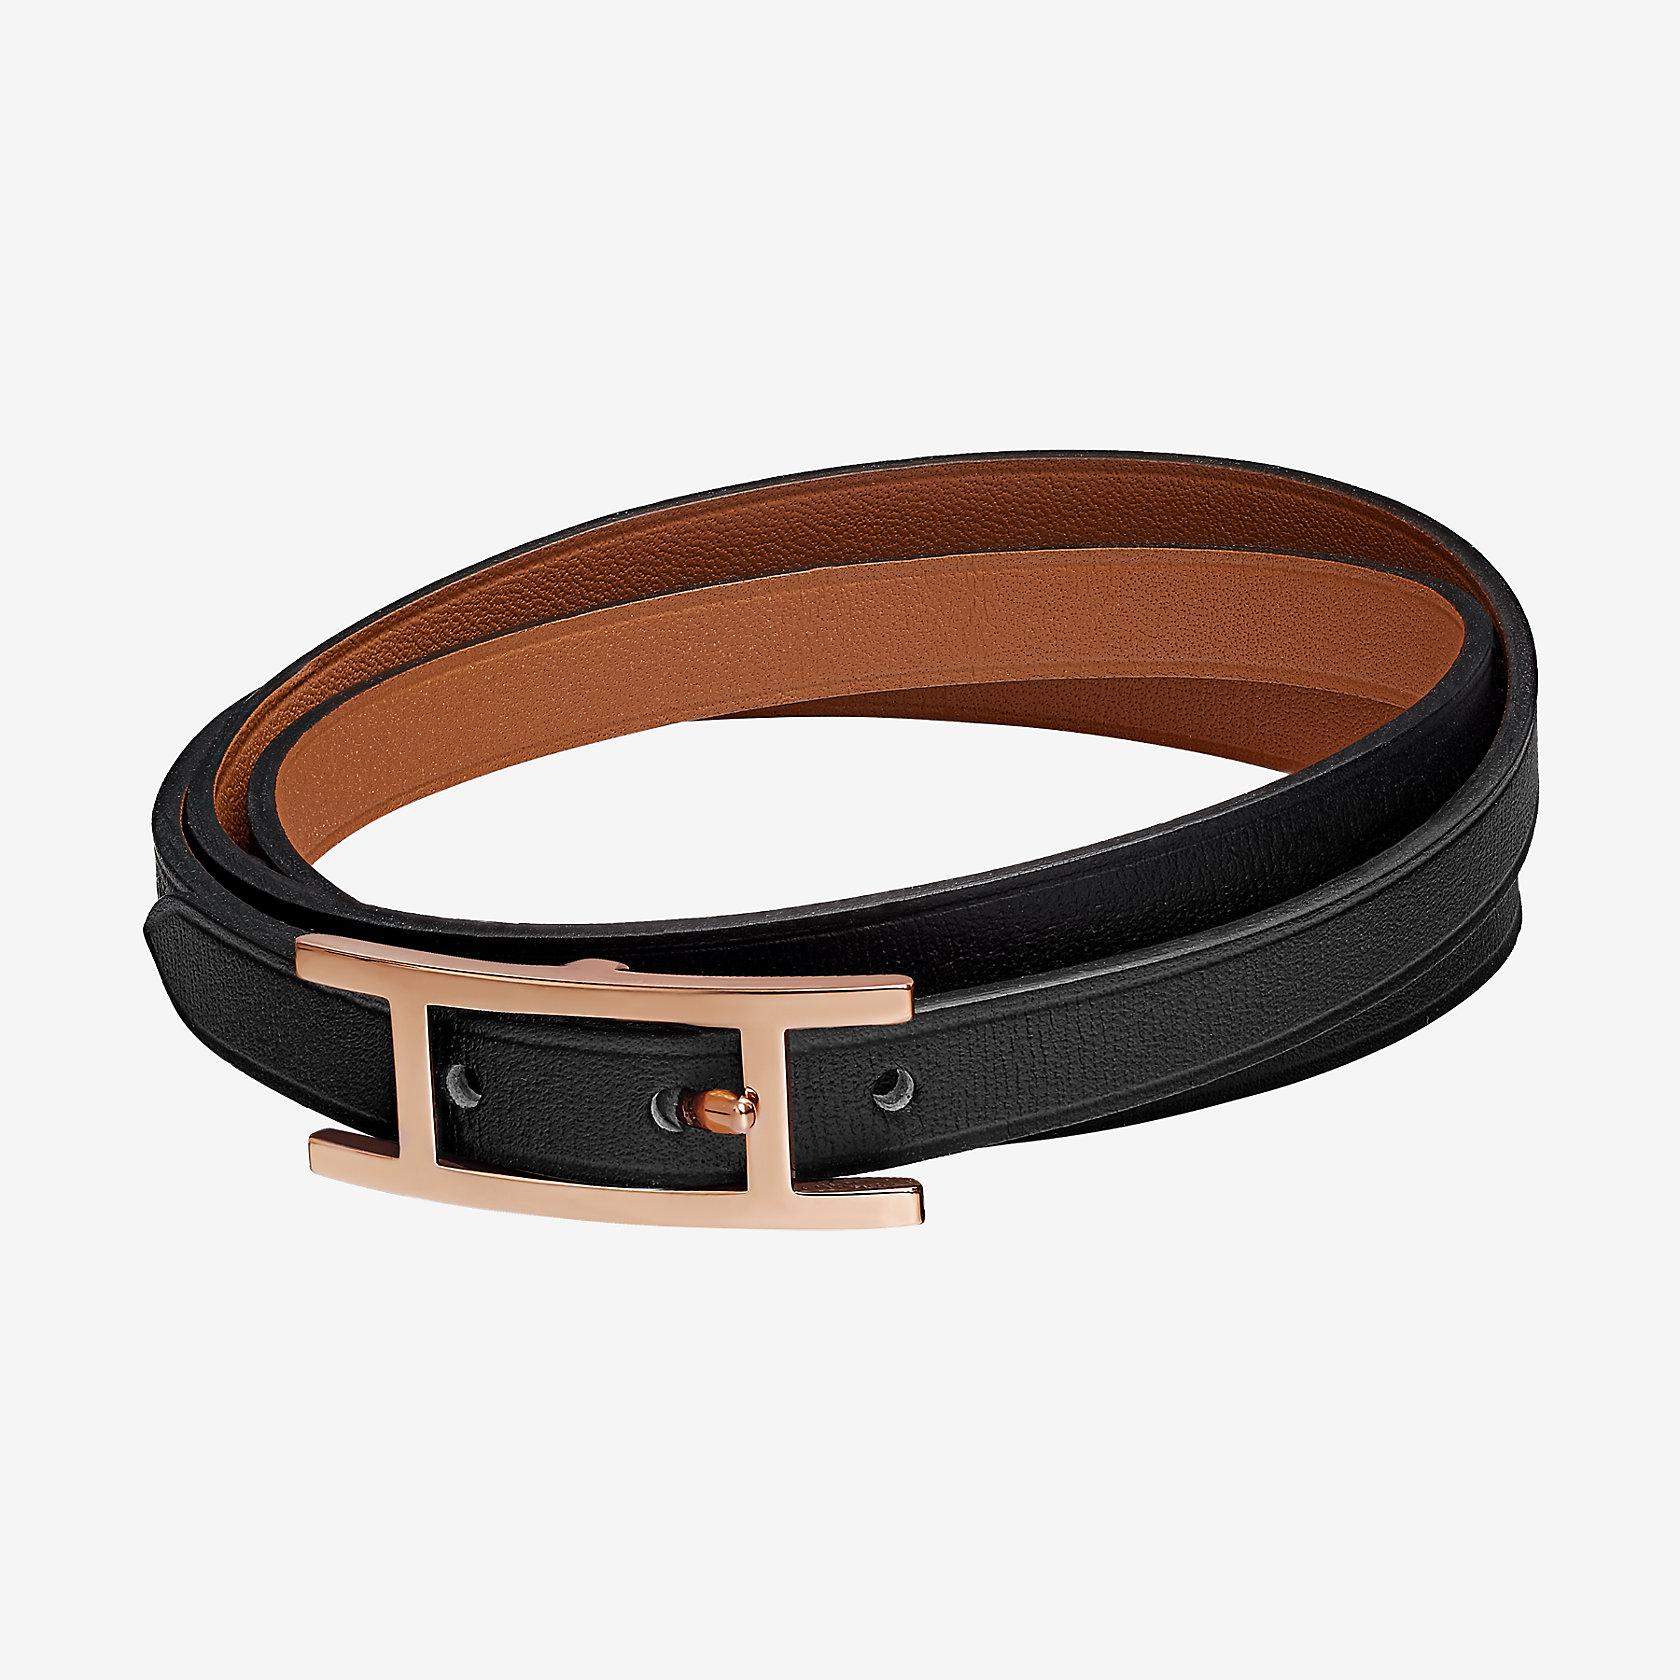 Bracelet Hapi 3, moyen modèle